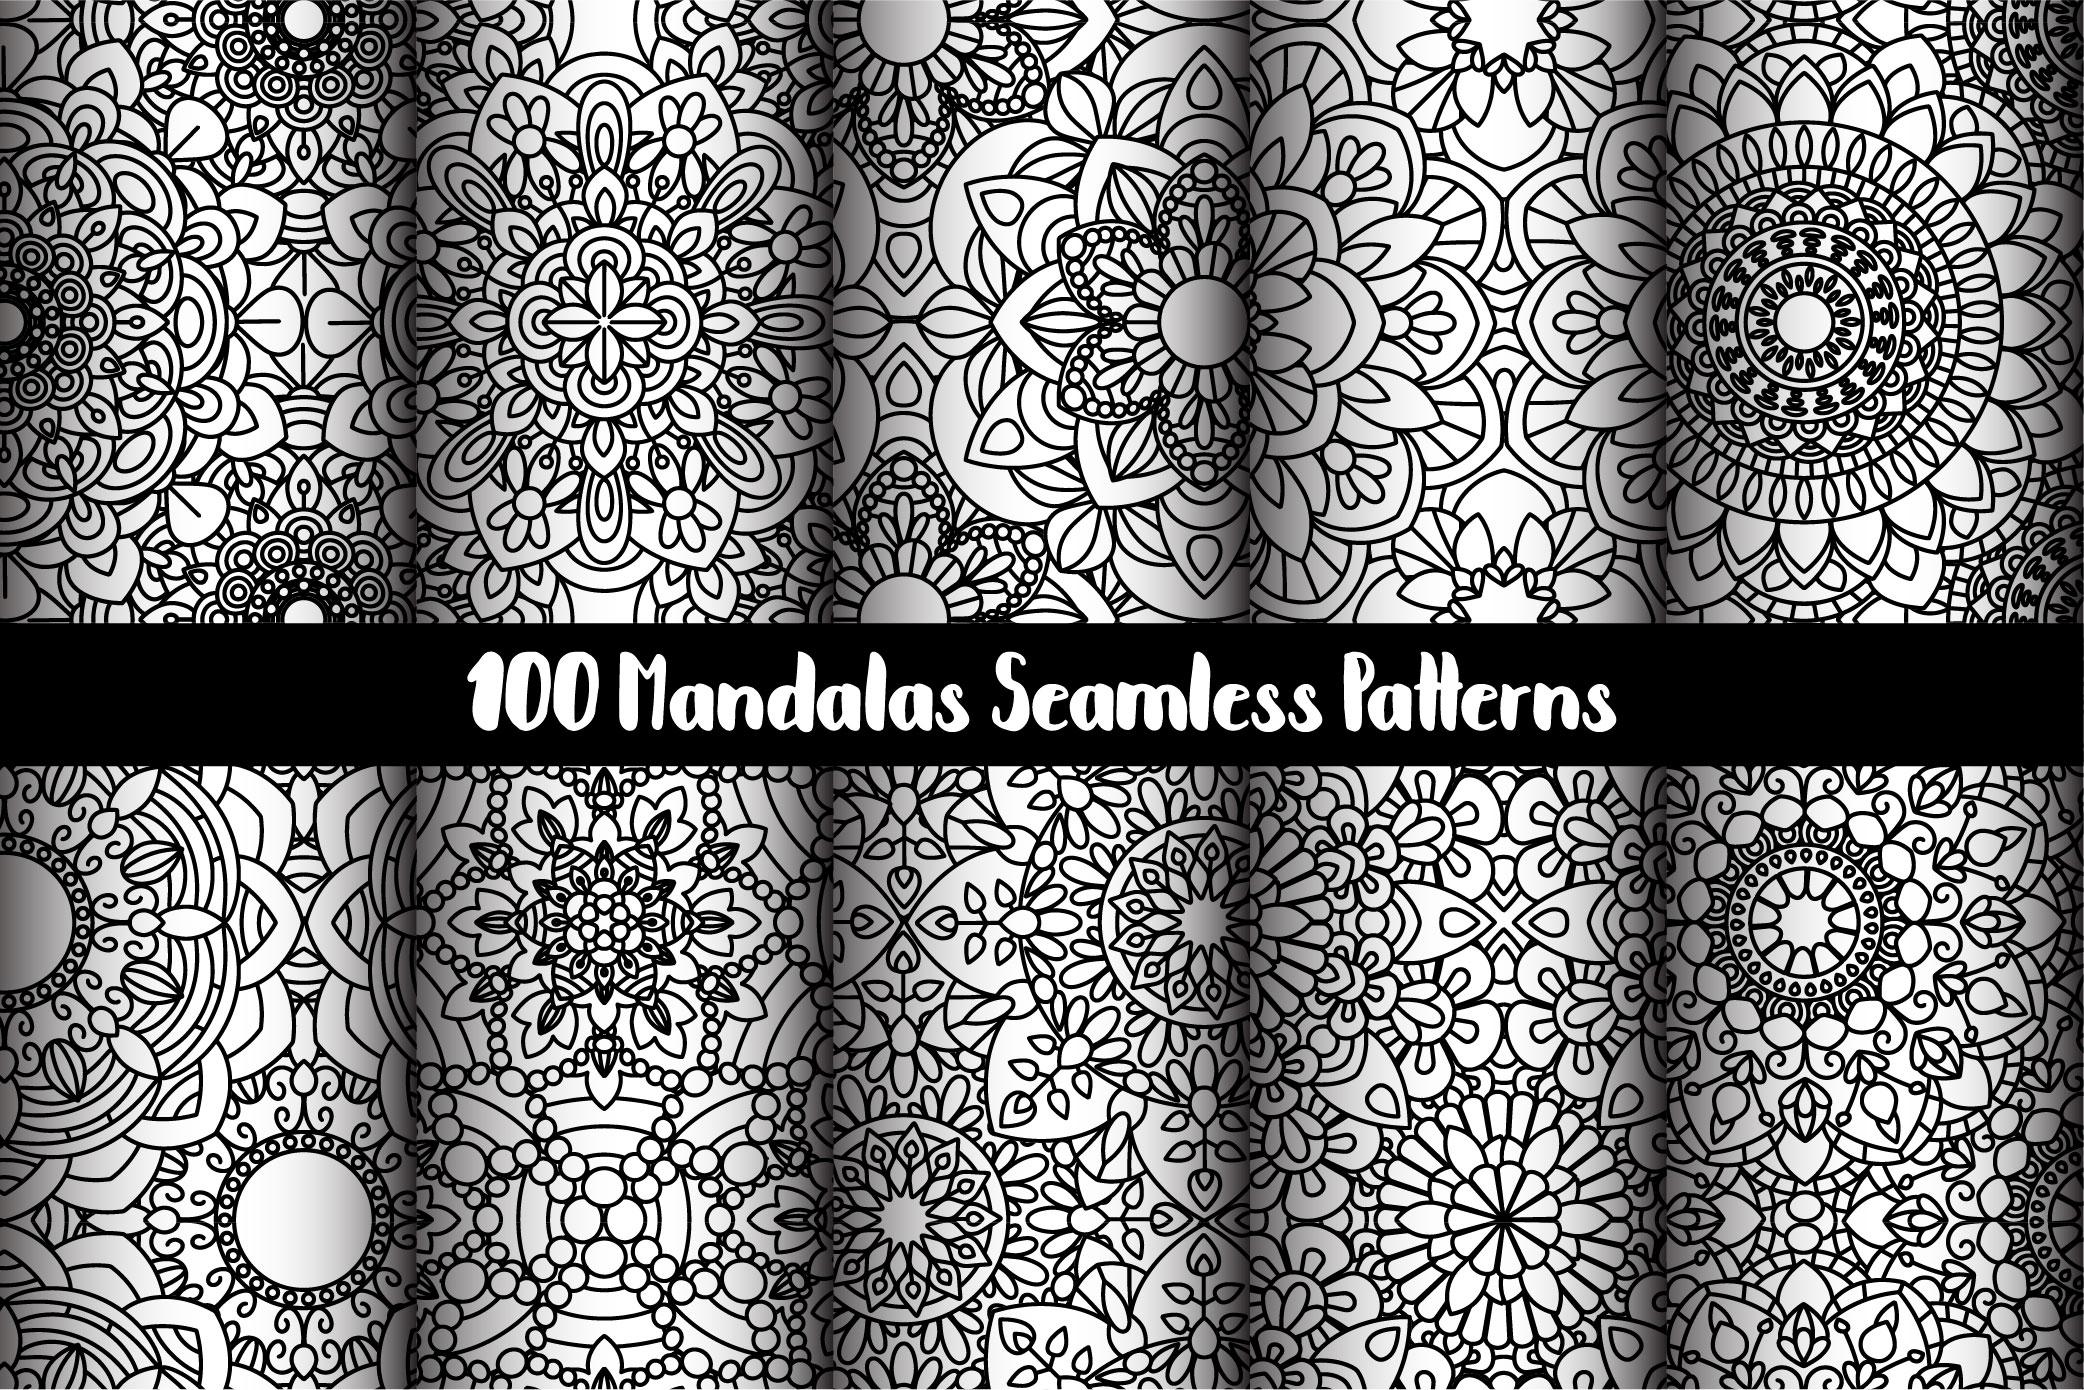 100 Mandalas Seamless Patterns example image 17